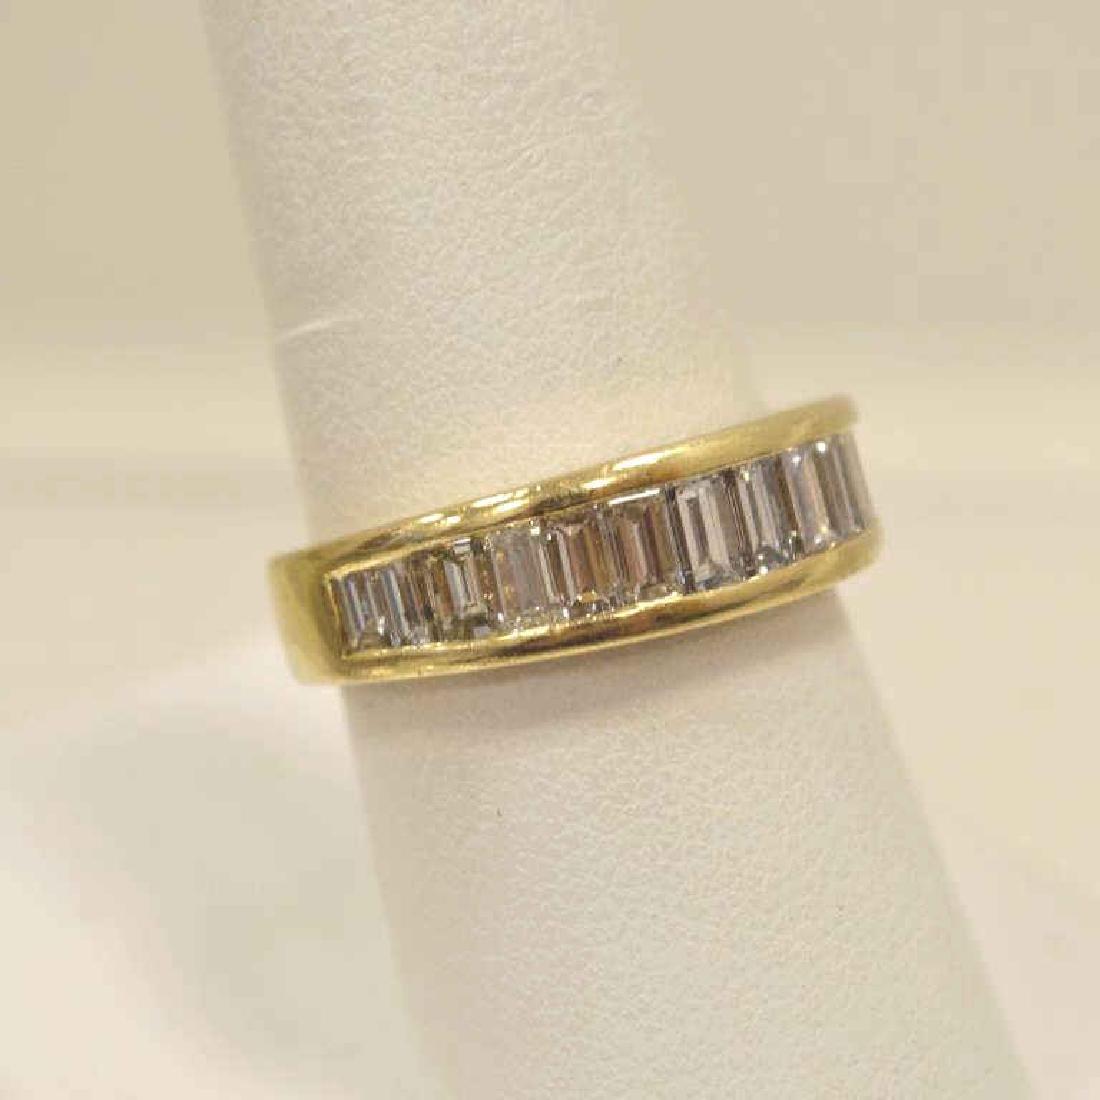 14kt yellow gold diamond wedding band - 2